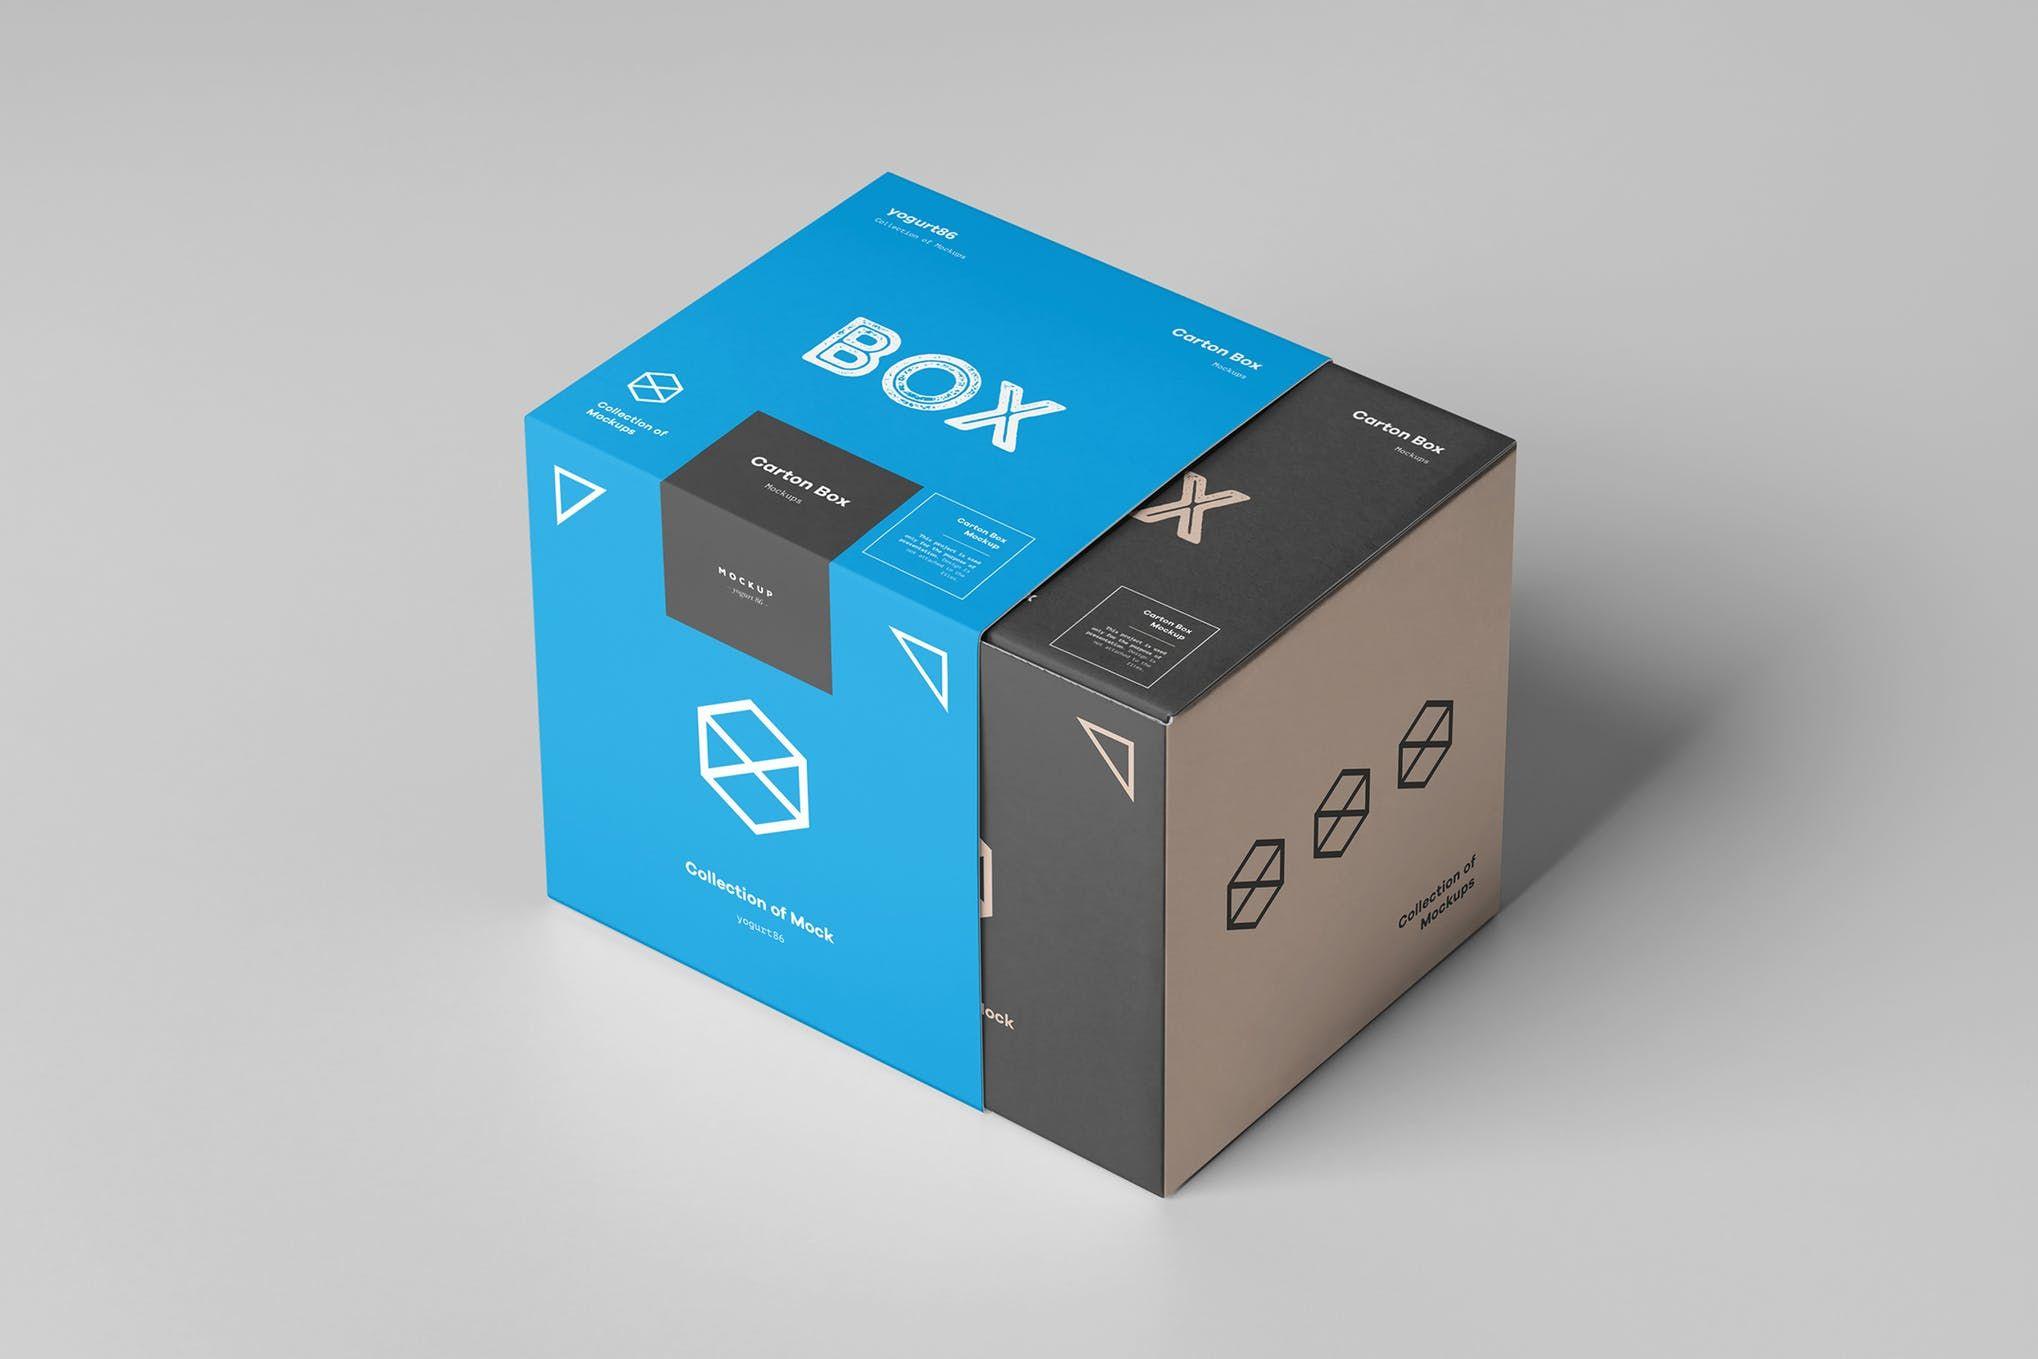 Download Carton Box Mockup 100x100x100 Wrapper By Yogurt86 On Envato Elements Box Mockup Carton Box Box Packaging Design